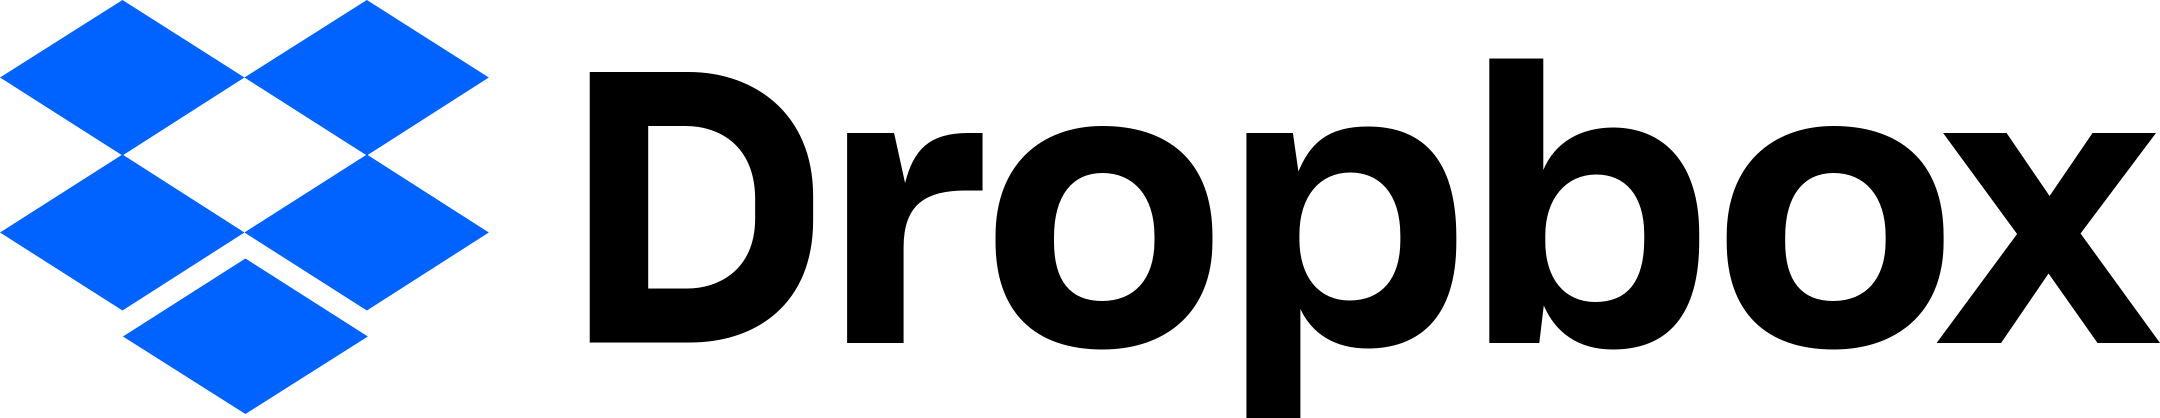 dropbox logo 1 - Dropbox Logo